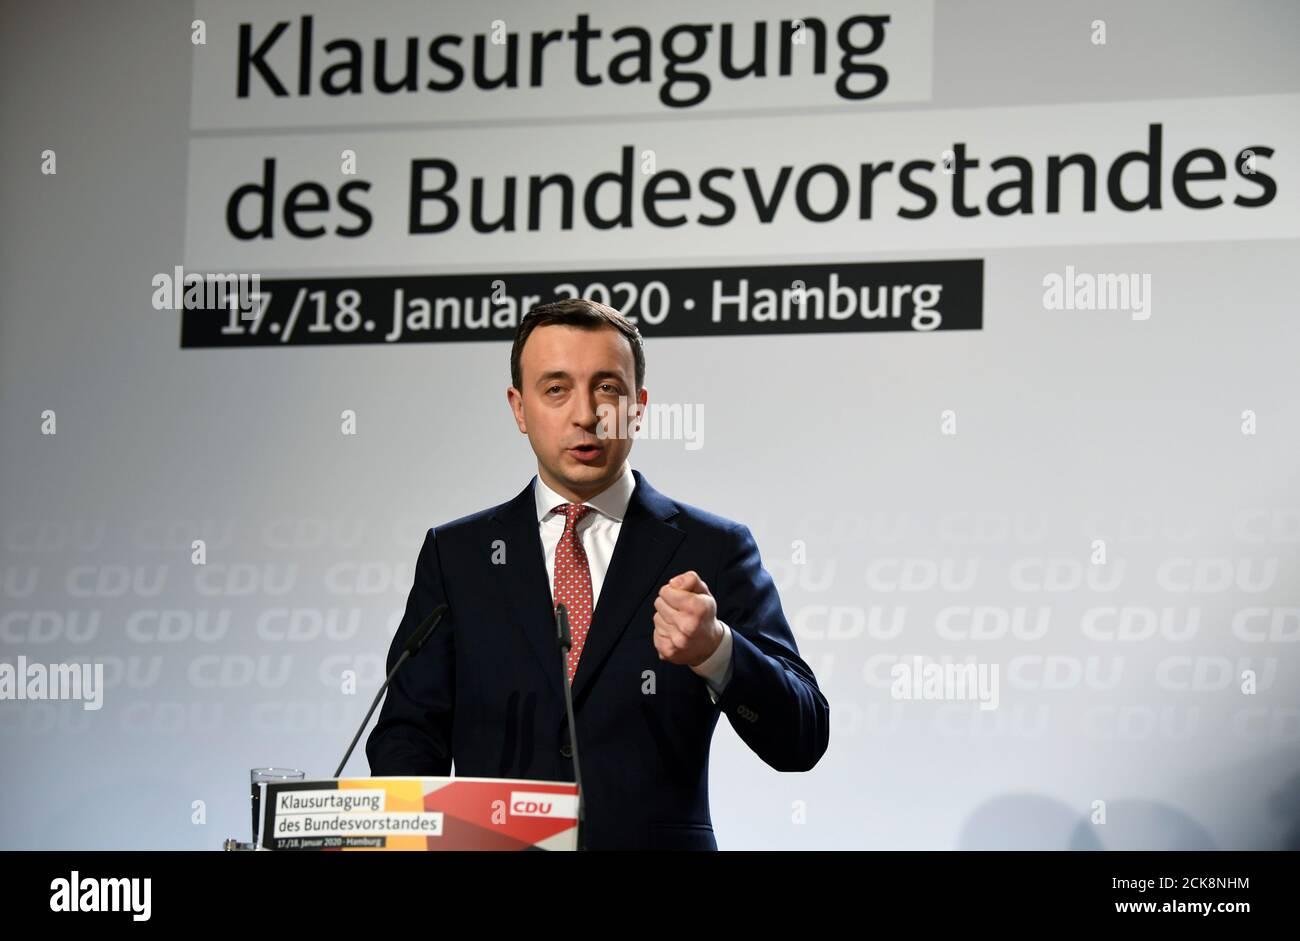 Germany's Christian Democratic Union Secretary General Paul Ziemiak speaks during a CDU board meeting Hamburg, Germany January 17, 2020. REUTERS/Fabian Bimmer Stock Photo